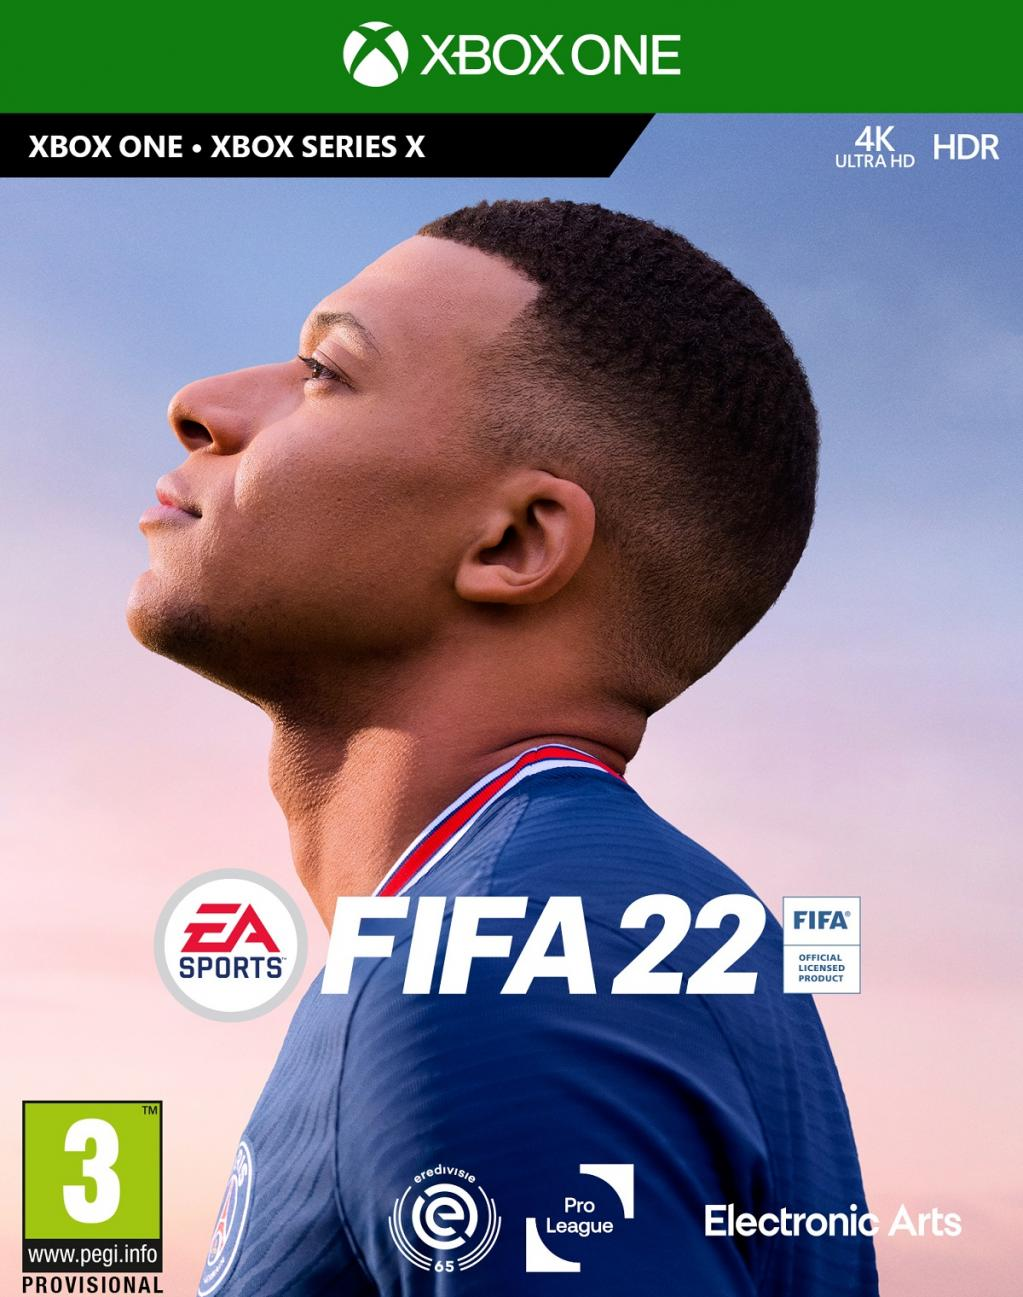 FIFA 22 - XBOX ONE & XBOX SX_1